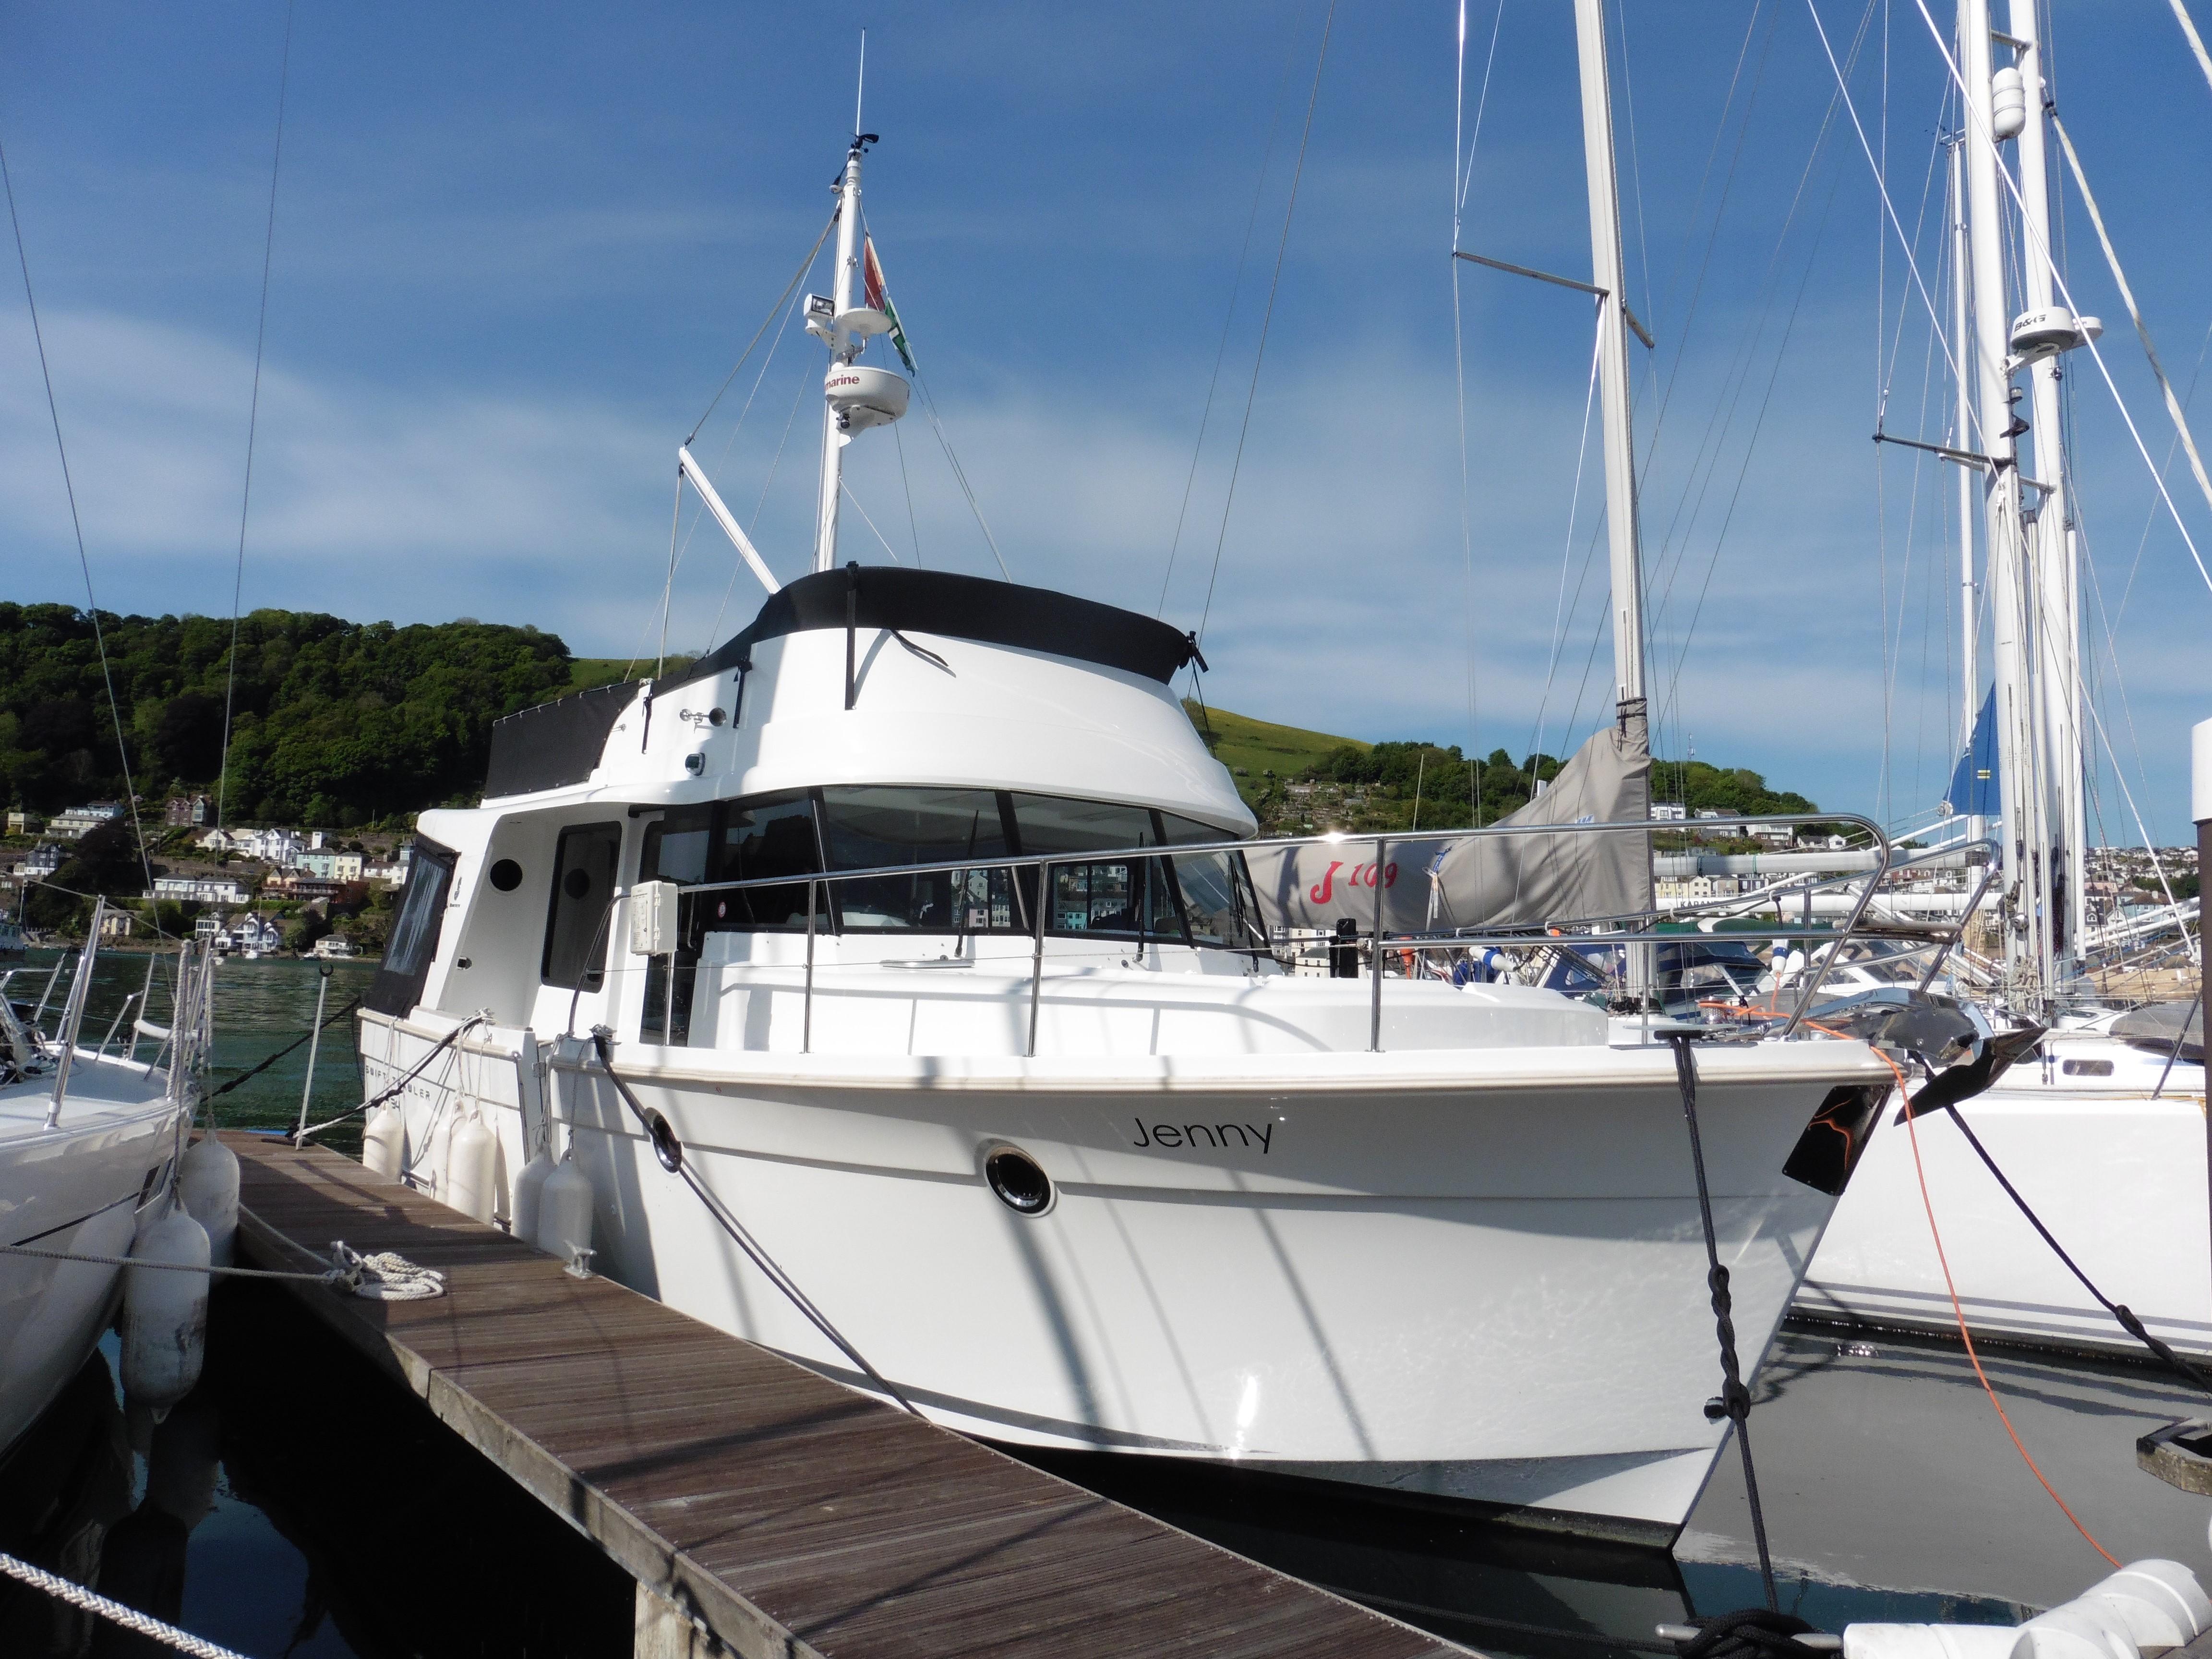 Beneteau Swift Trawler 34 Beneteau Swift Trawler 34 Fly